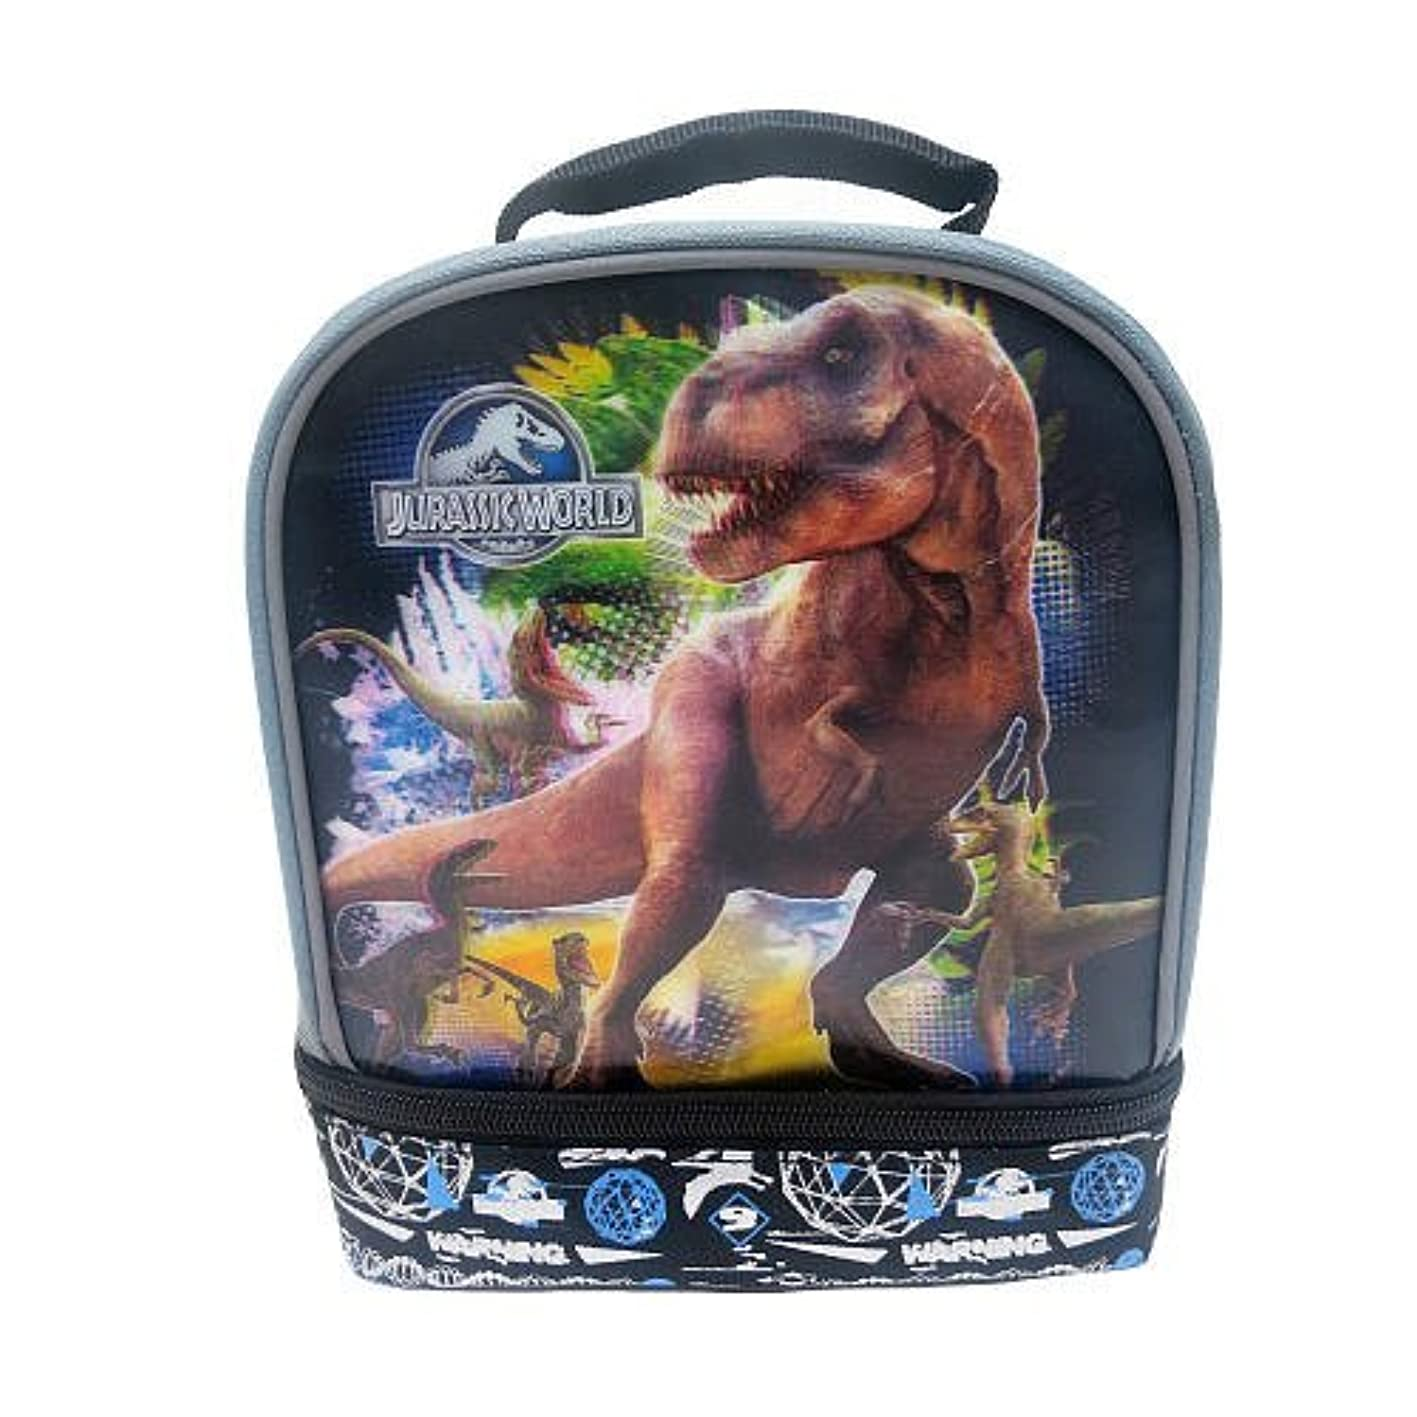 JURASSIC WORLD 3-D T-REX Dual-Chamber Lead-Safe Insulated Lunch Tote Box Bag lgaeoxqxcjz479